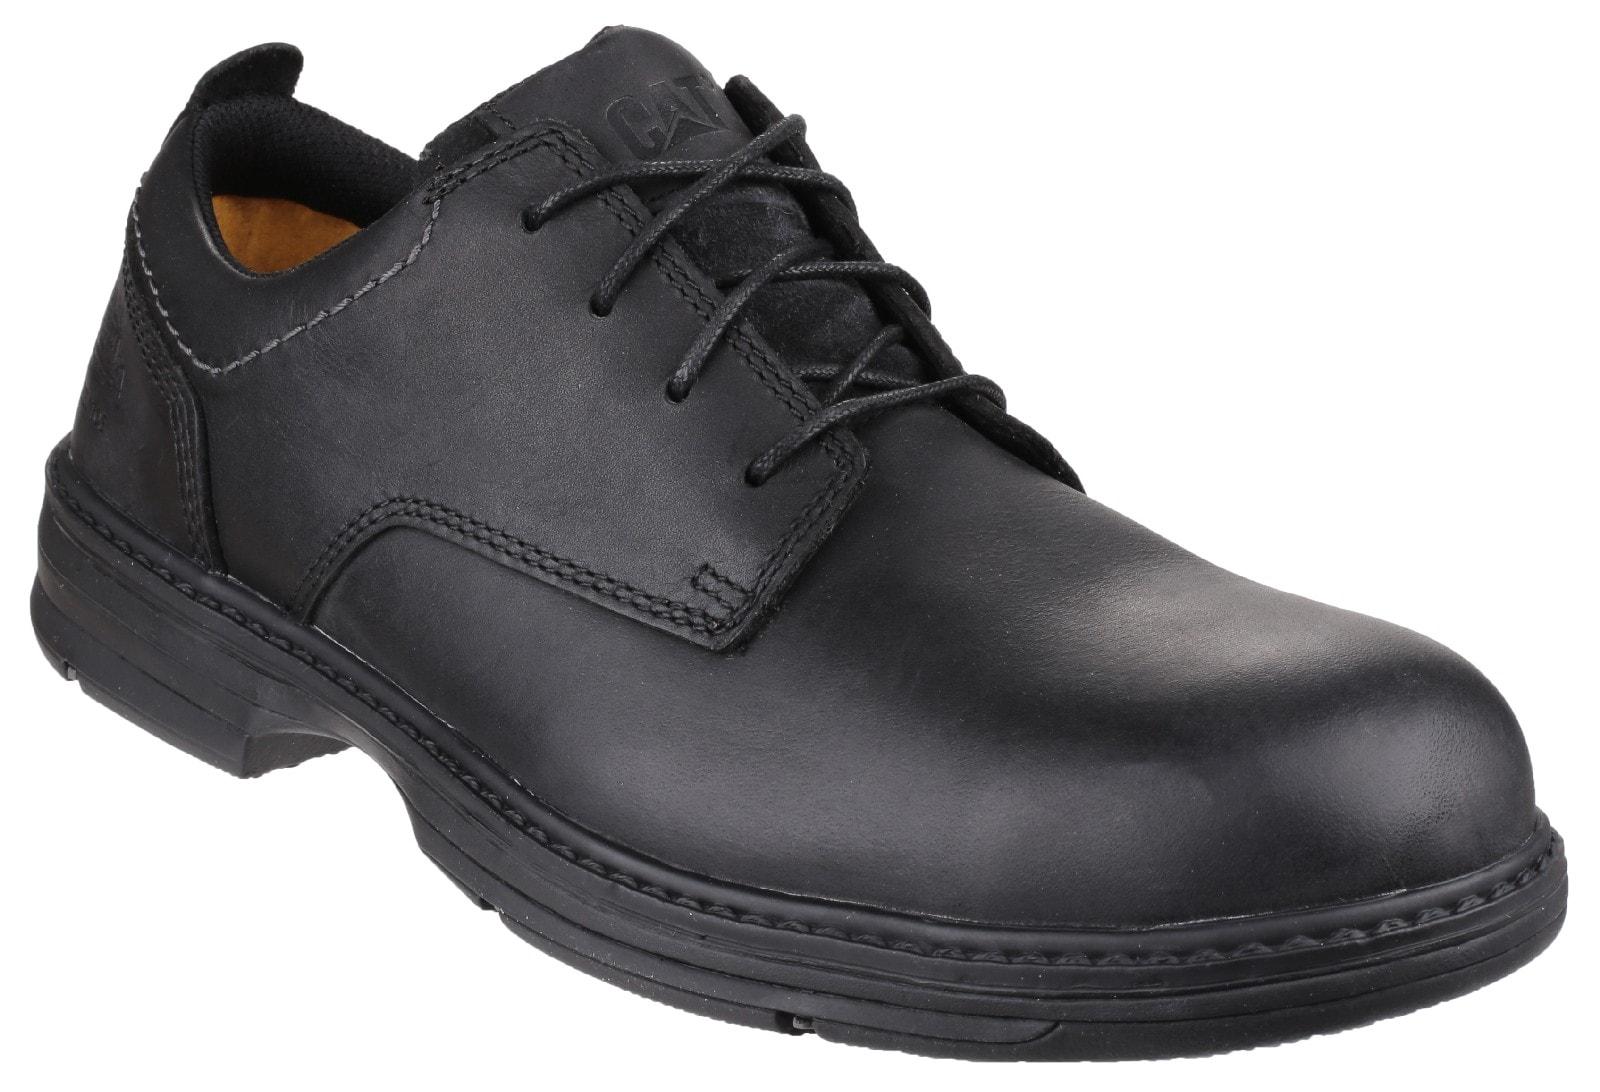 Caterpillar Inherit Steel Toe-cap & Midsole Safety Shoes